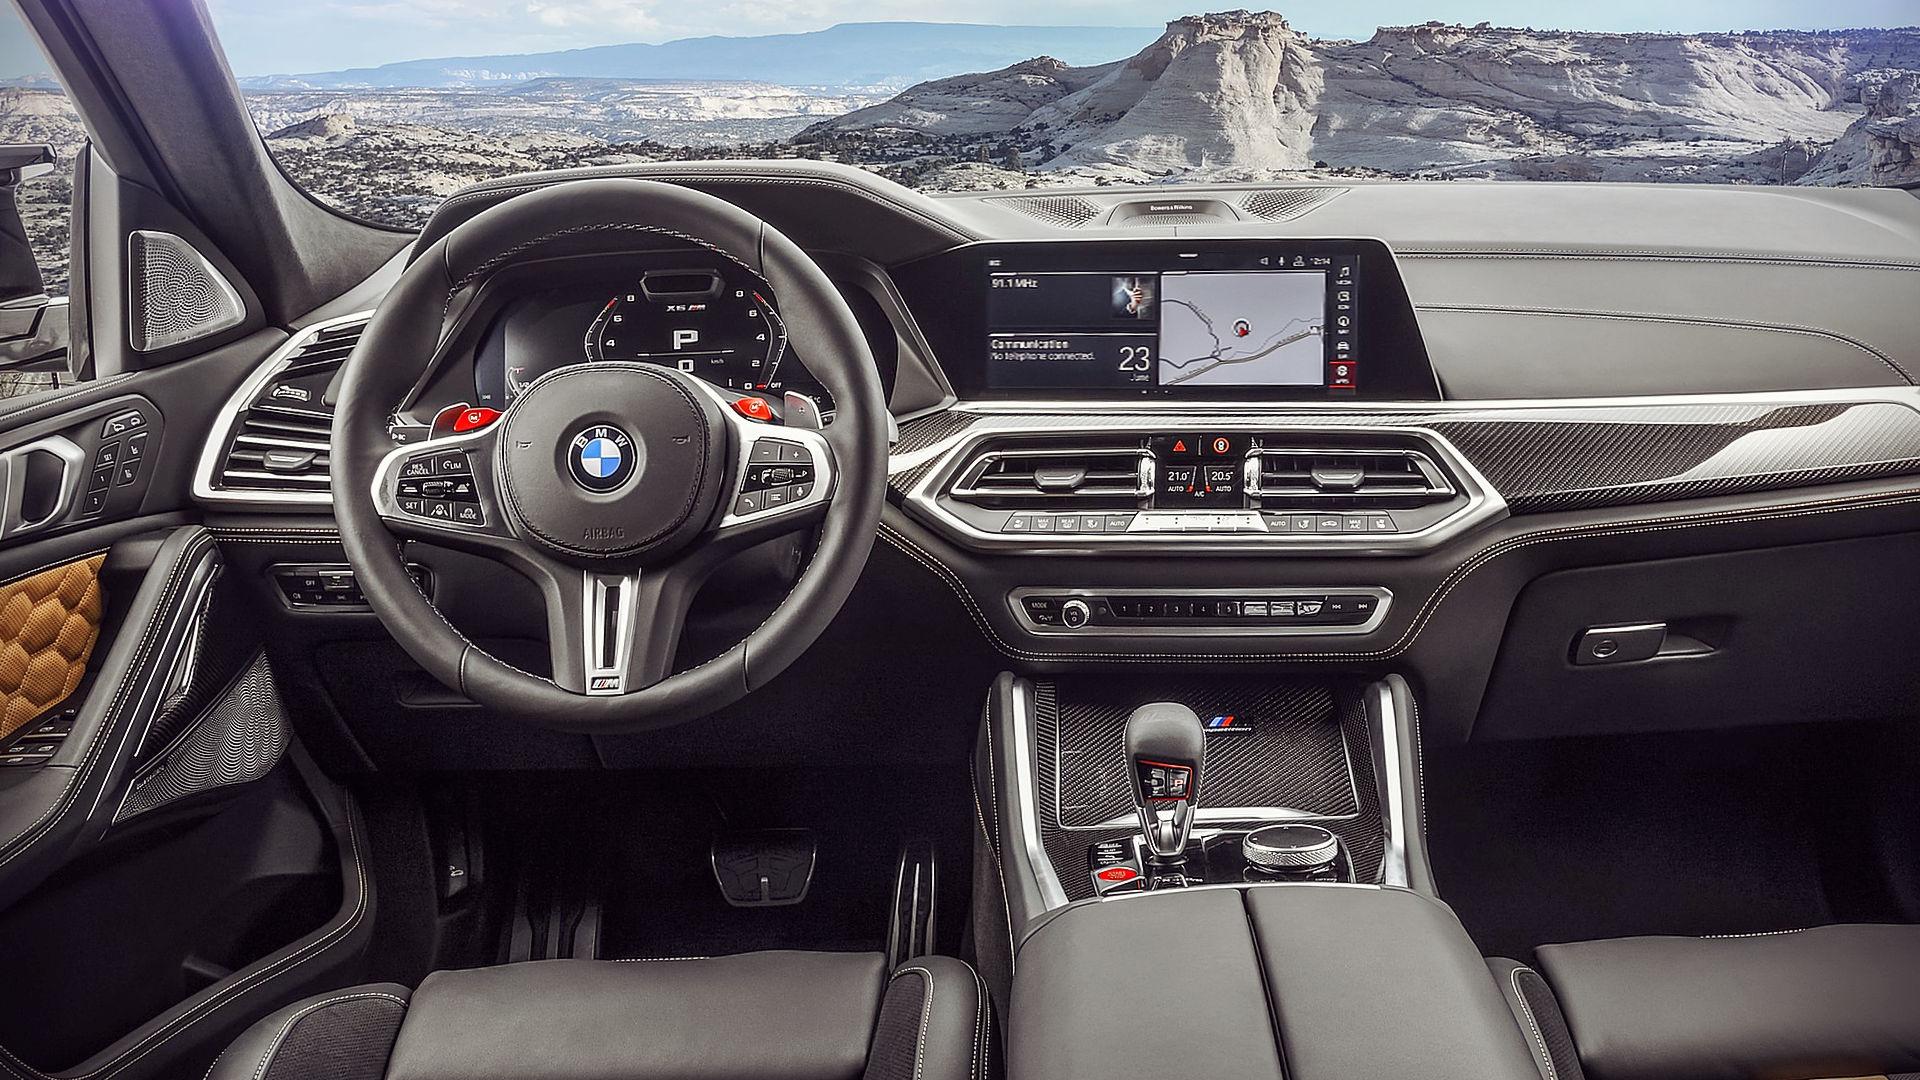 BMW X6 M Competition 2020 Interior Wallpaper